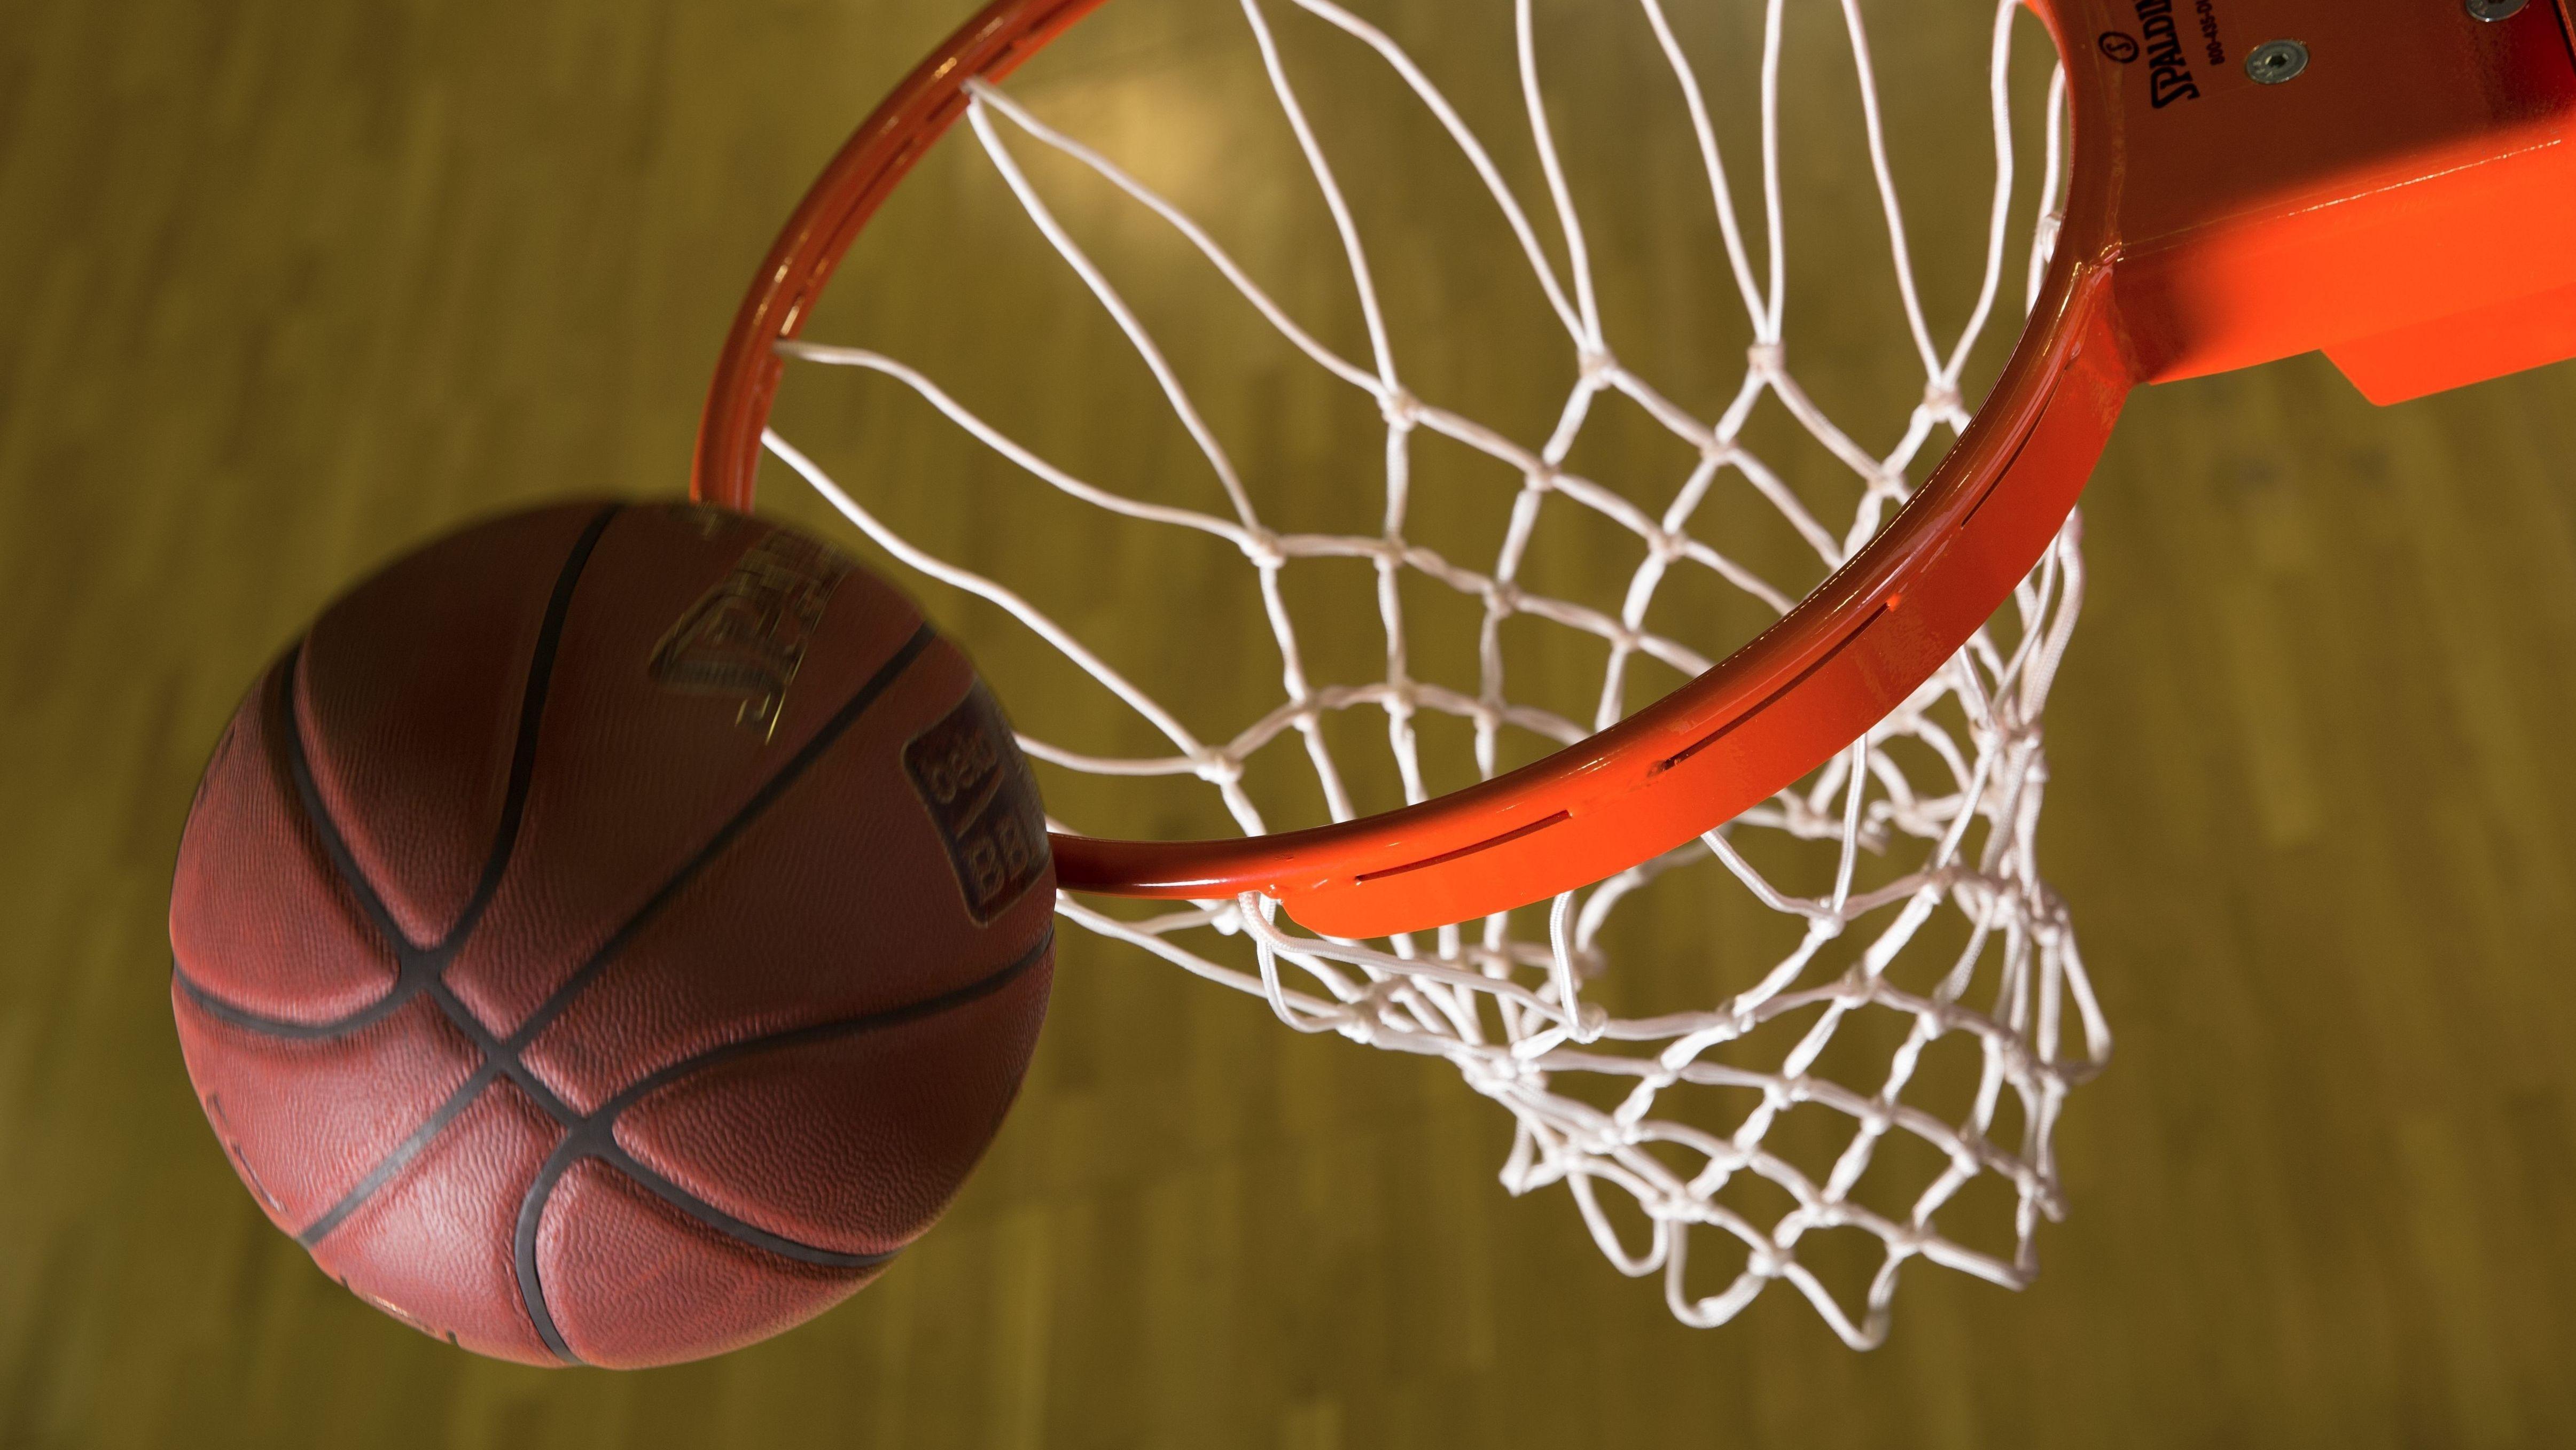 Basketball und Basketballkorb